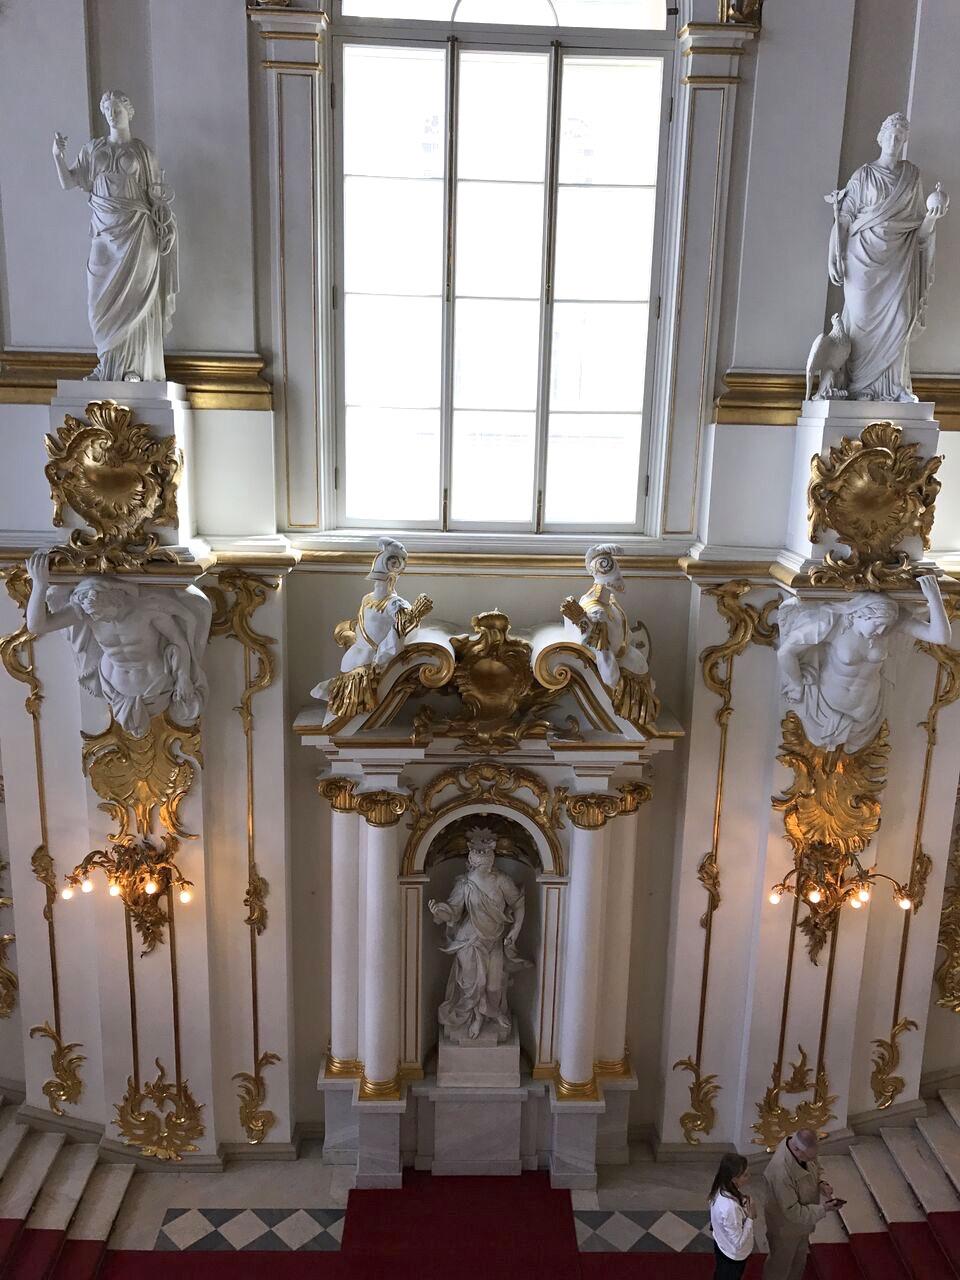 Teri_St.Petersburg_Hermitage_day2_spiritedtable_photo47.jpg